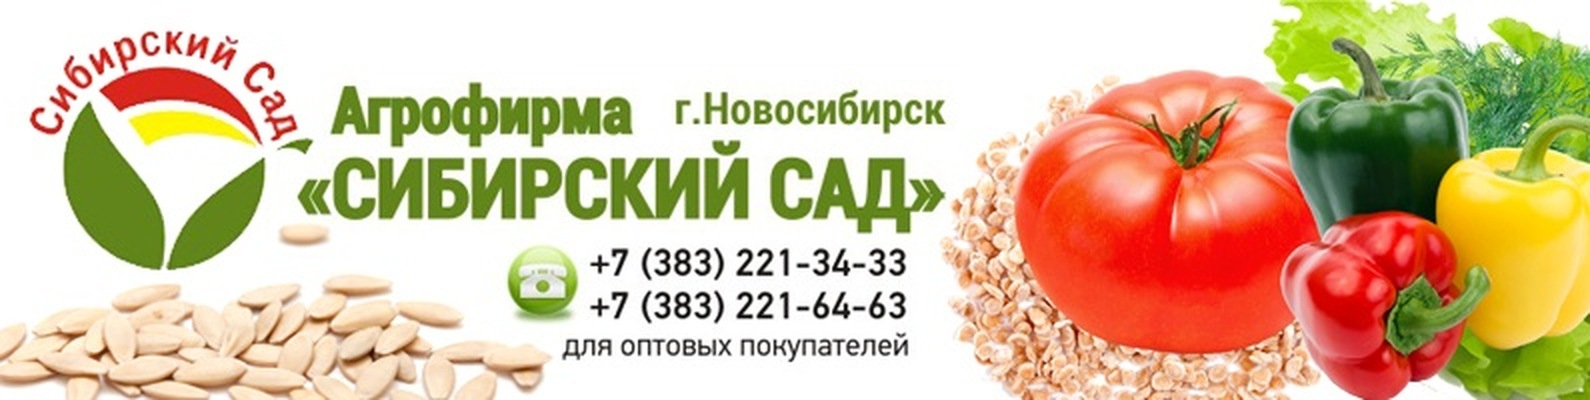 Www Sibsad Nsk Ru каталог семян